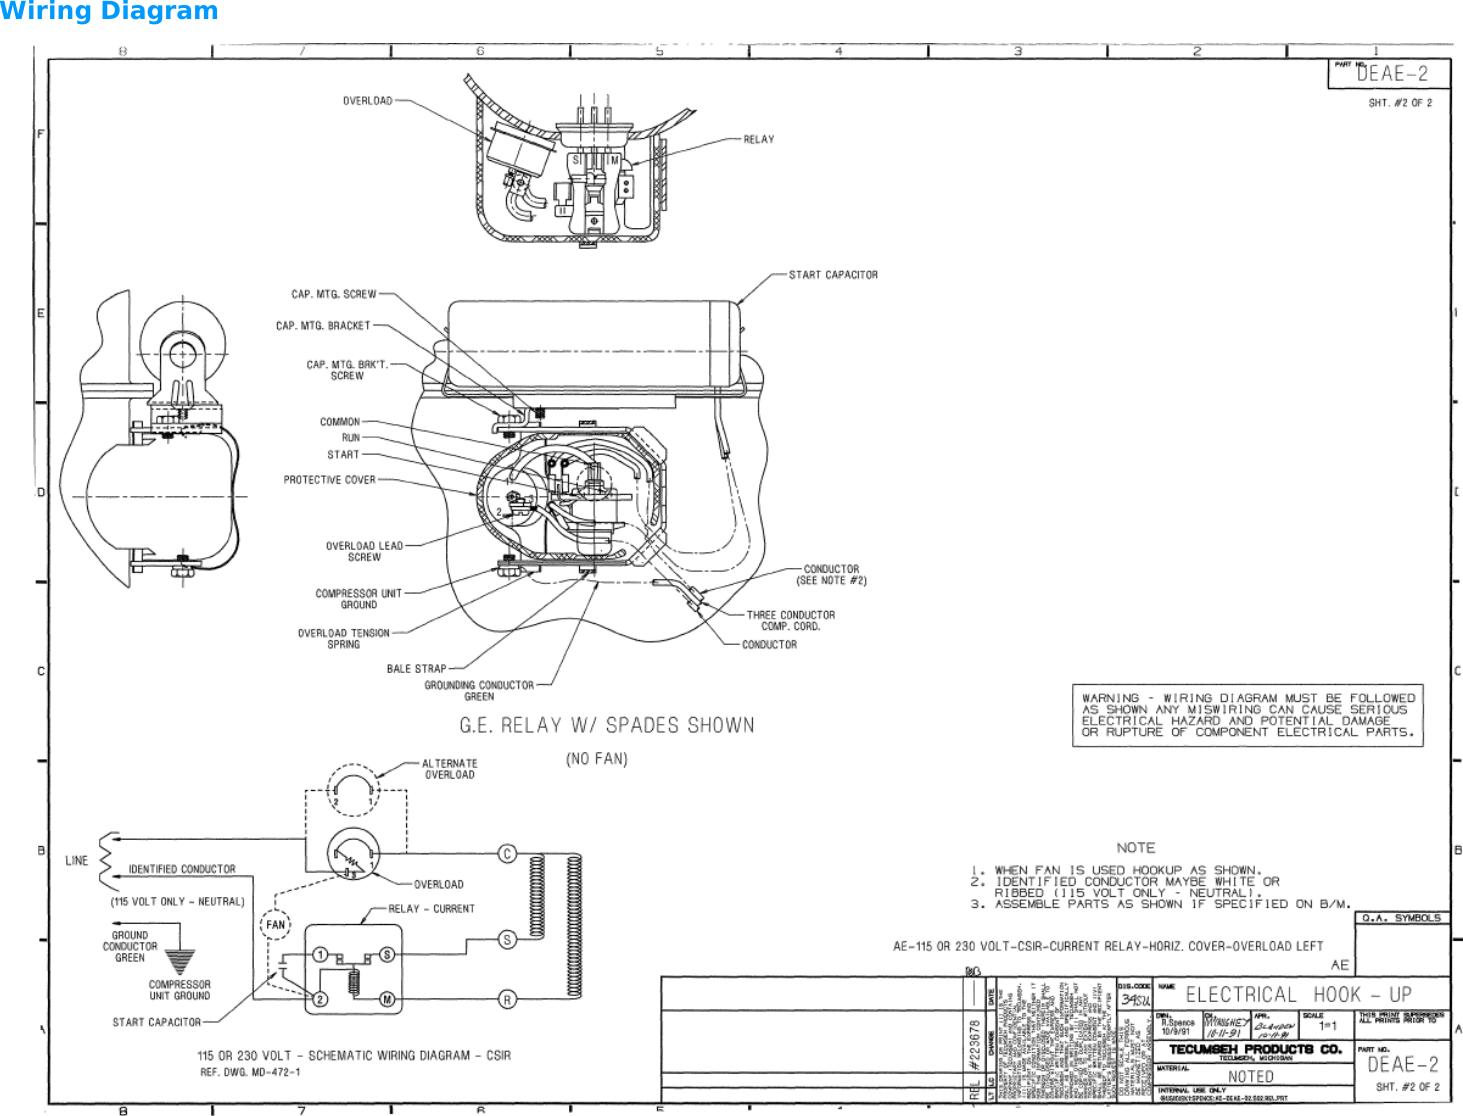 AEA4440YXA Compressor Data Sheet